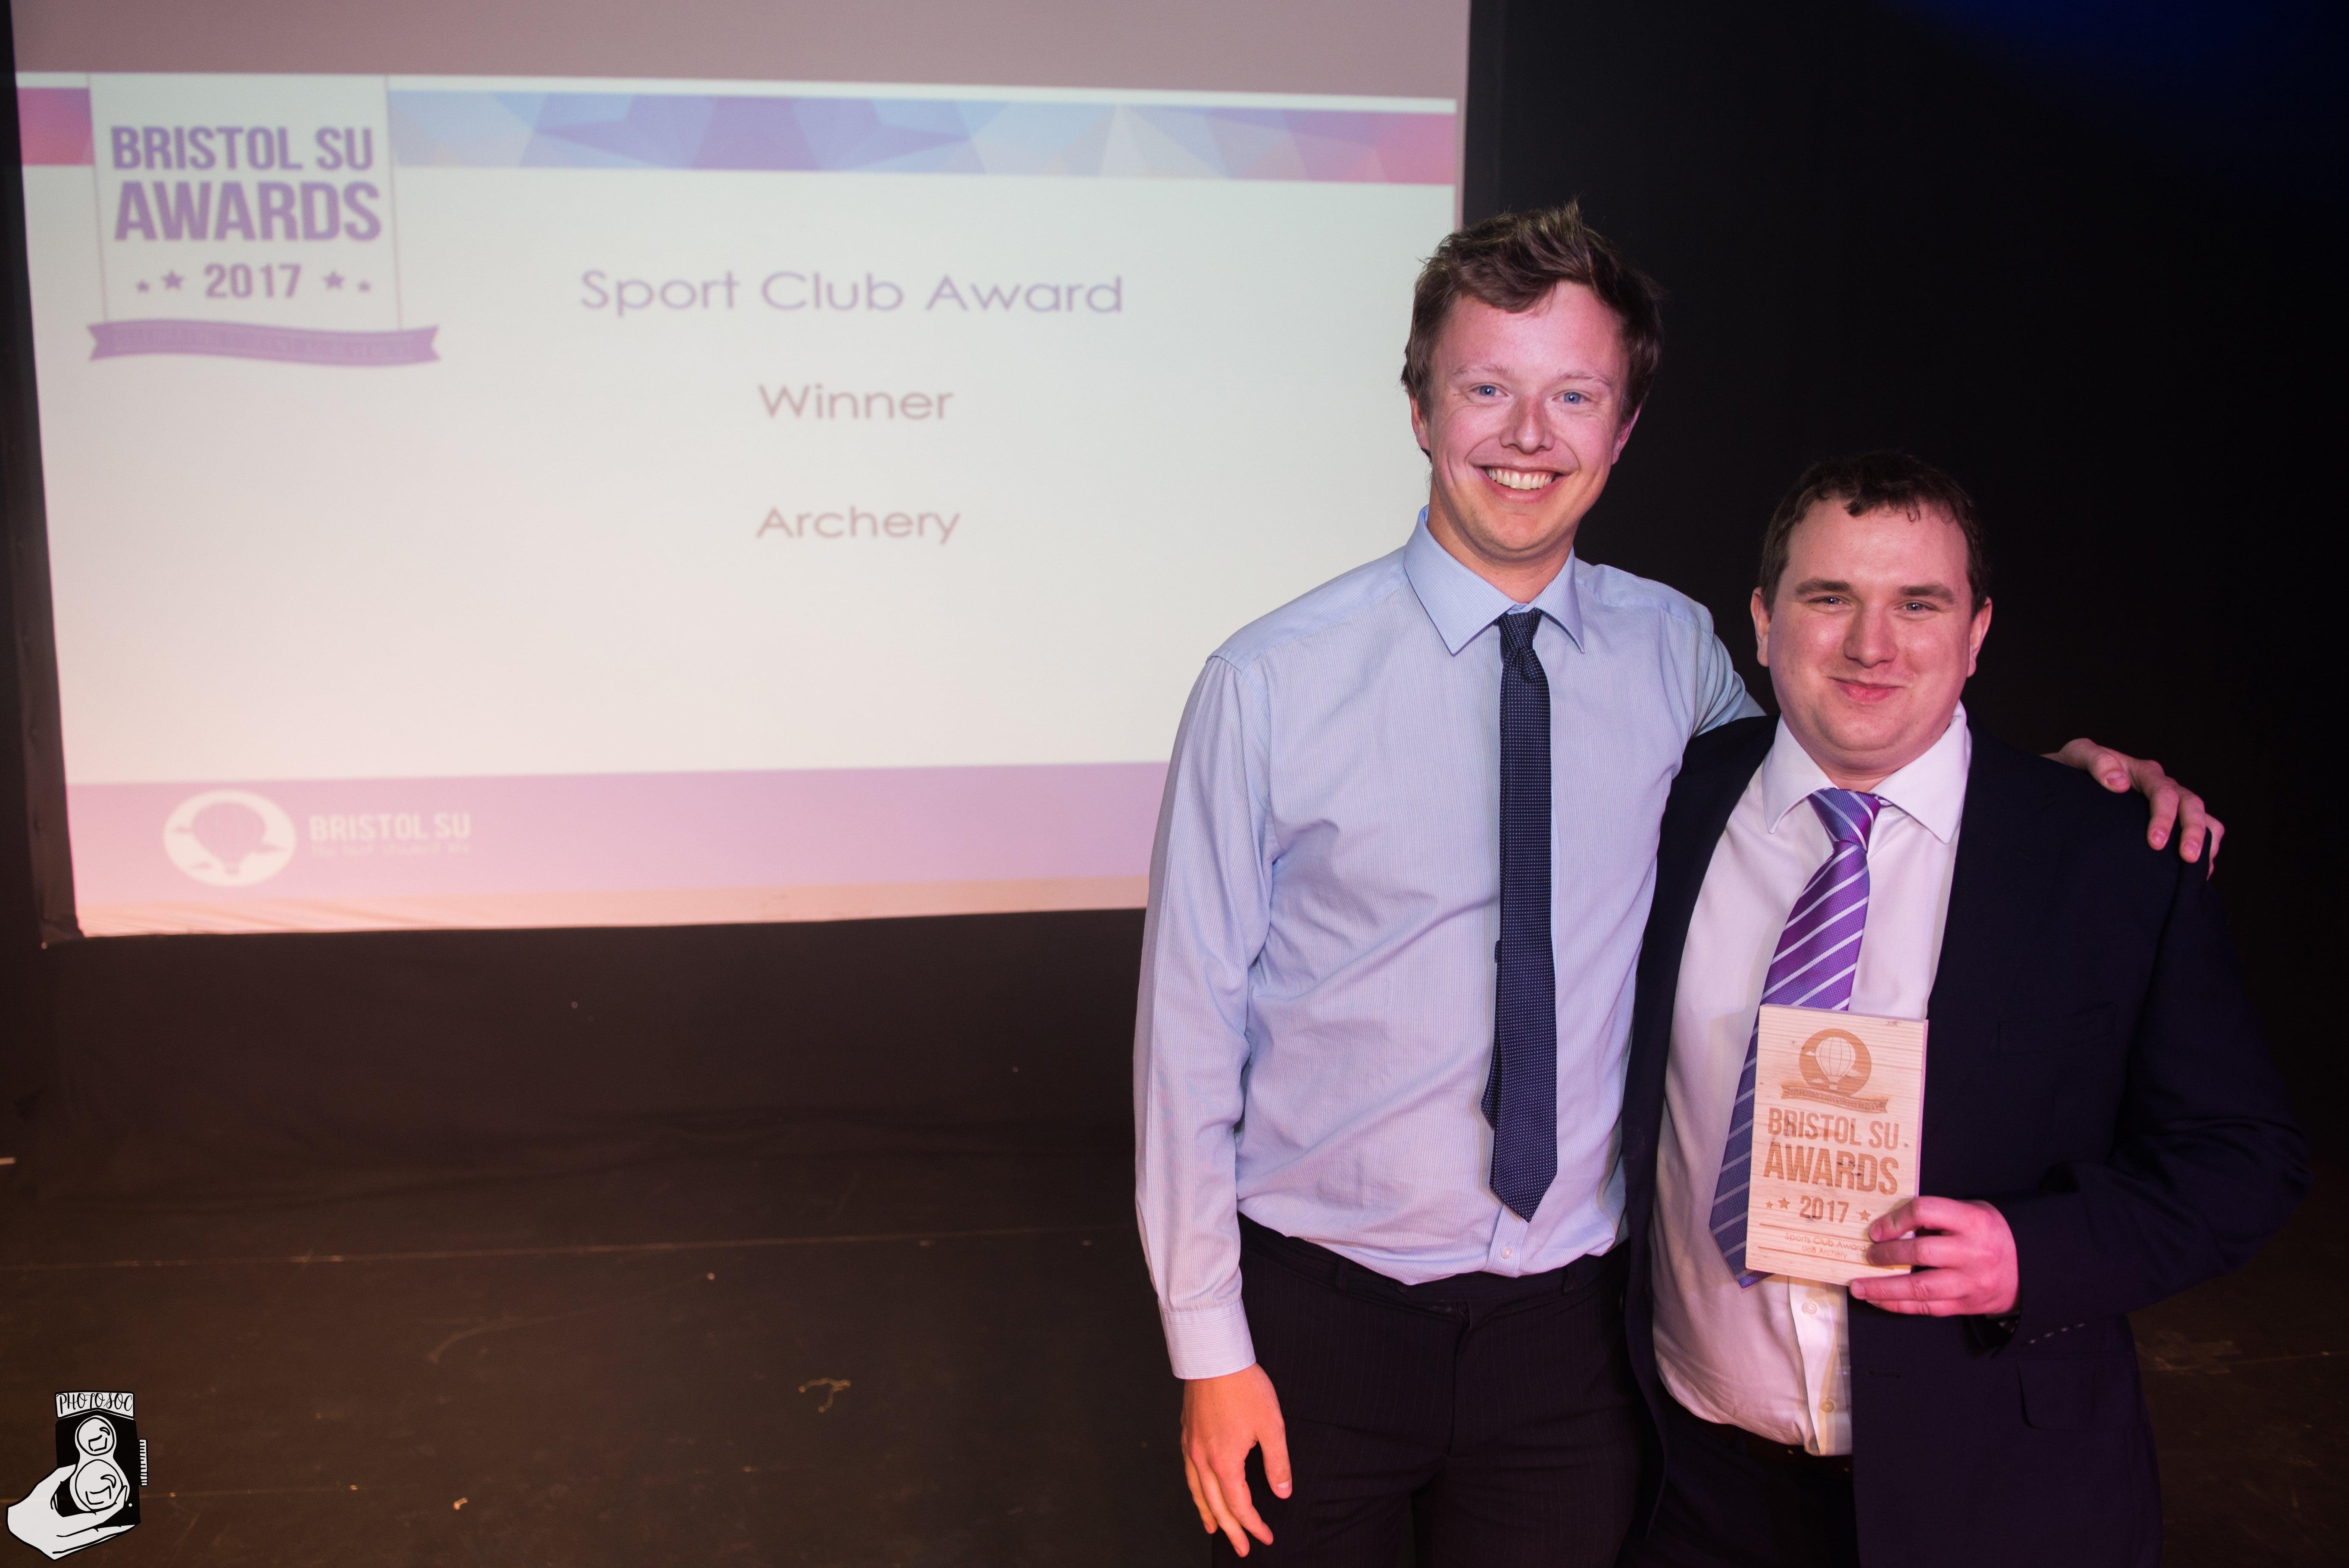 Archery rep accepting sports club award